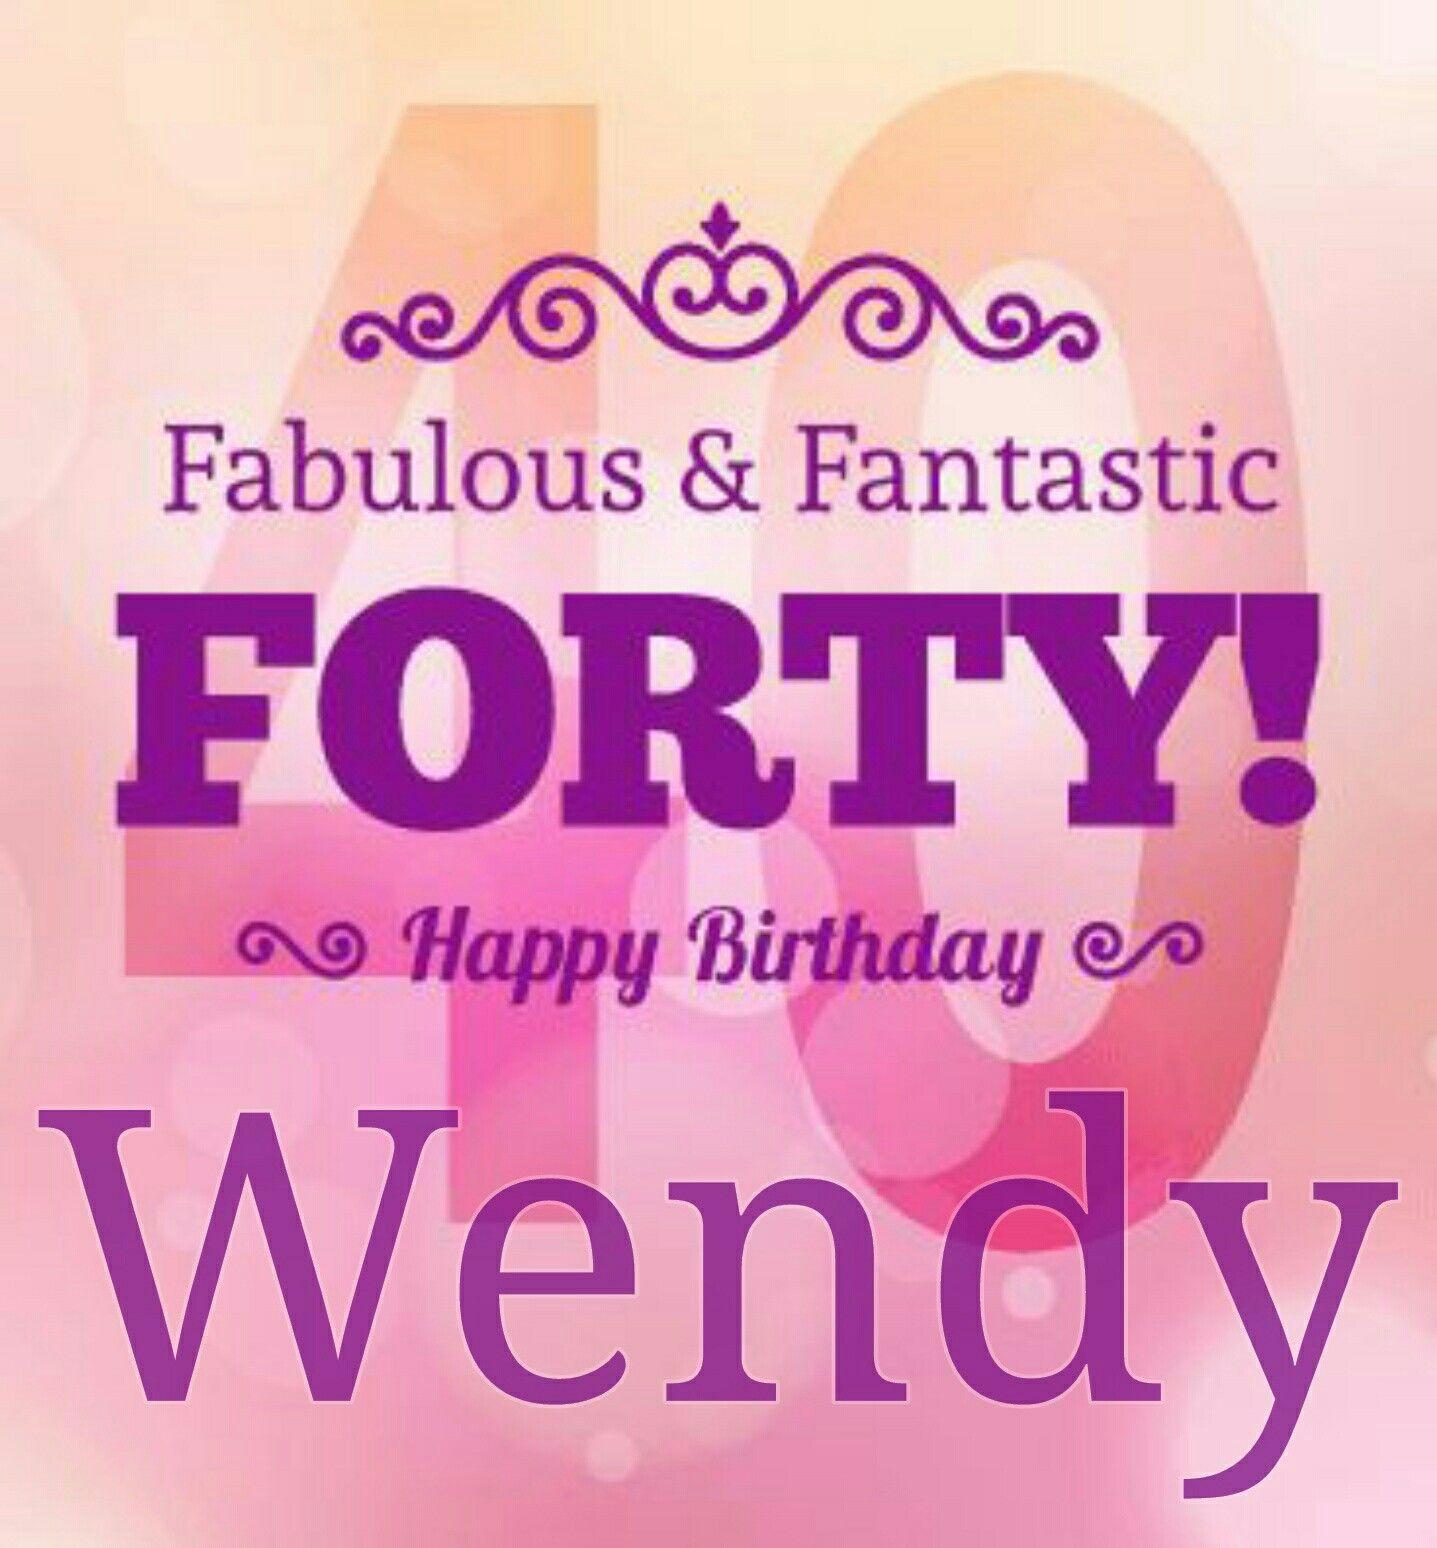 Happy 40th Birthday Wendy Happy Birthday my Friend